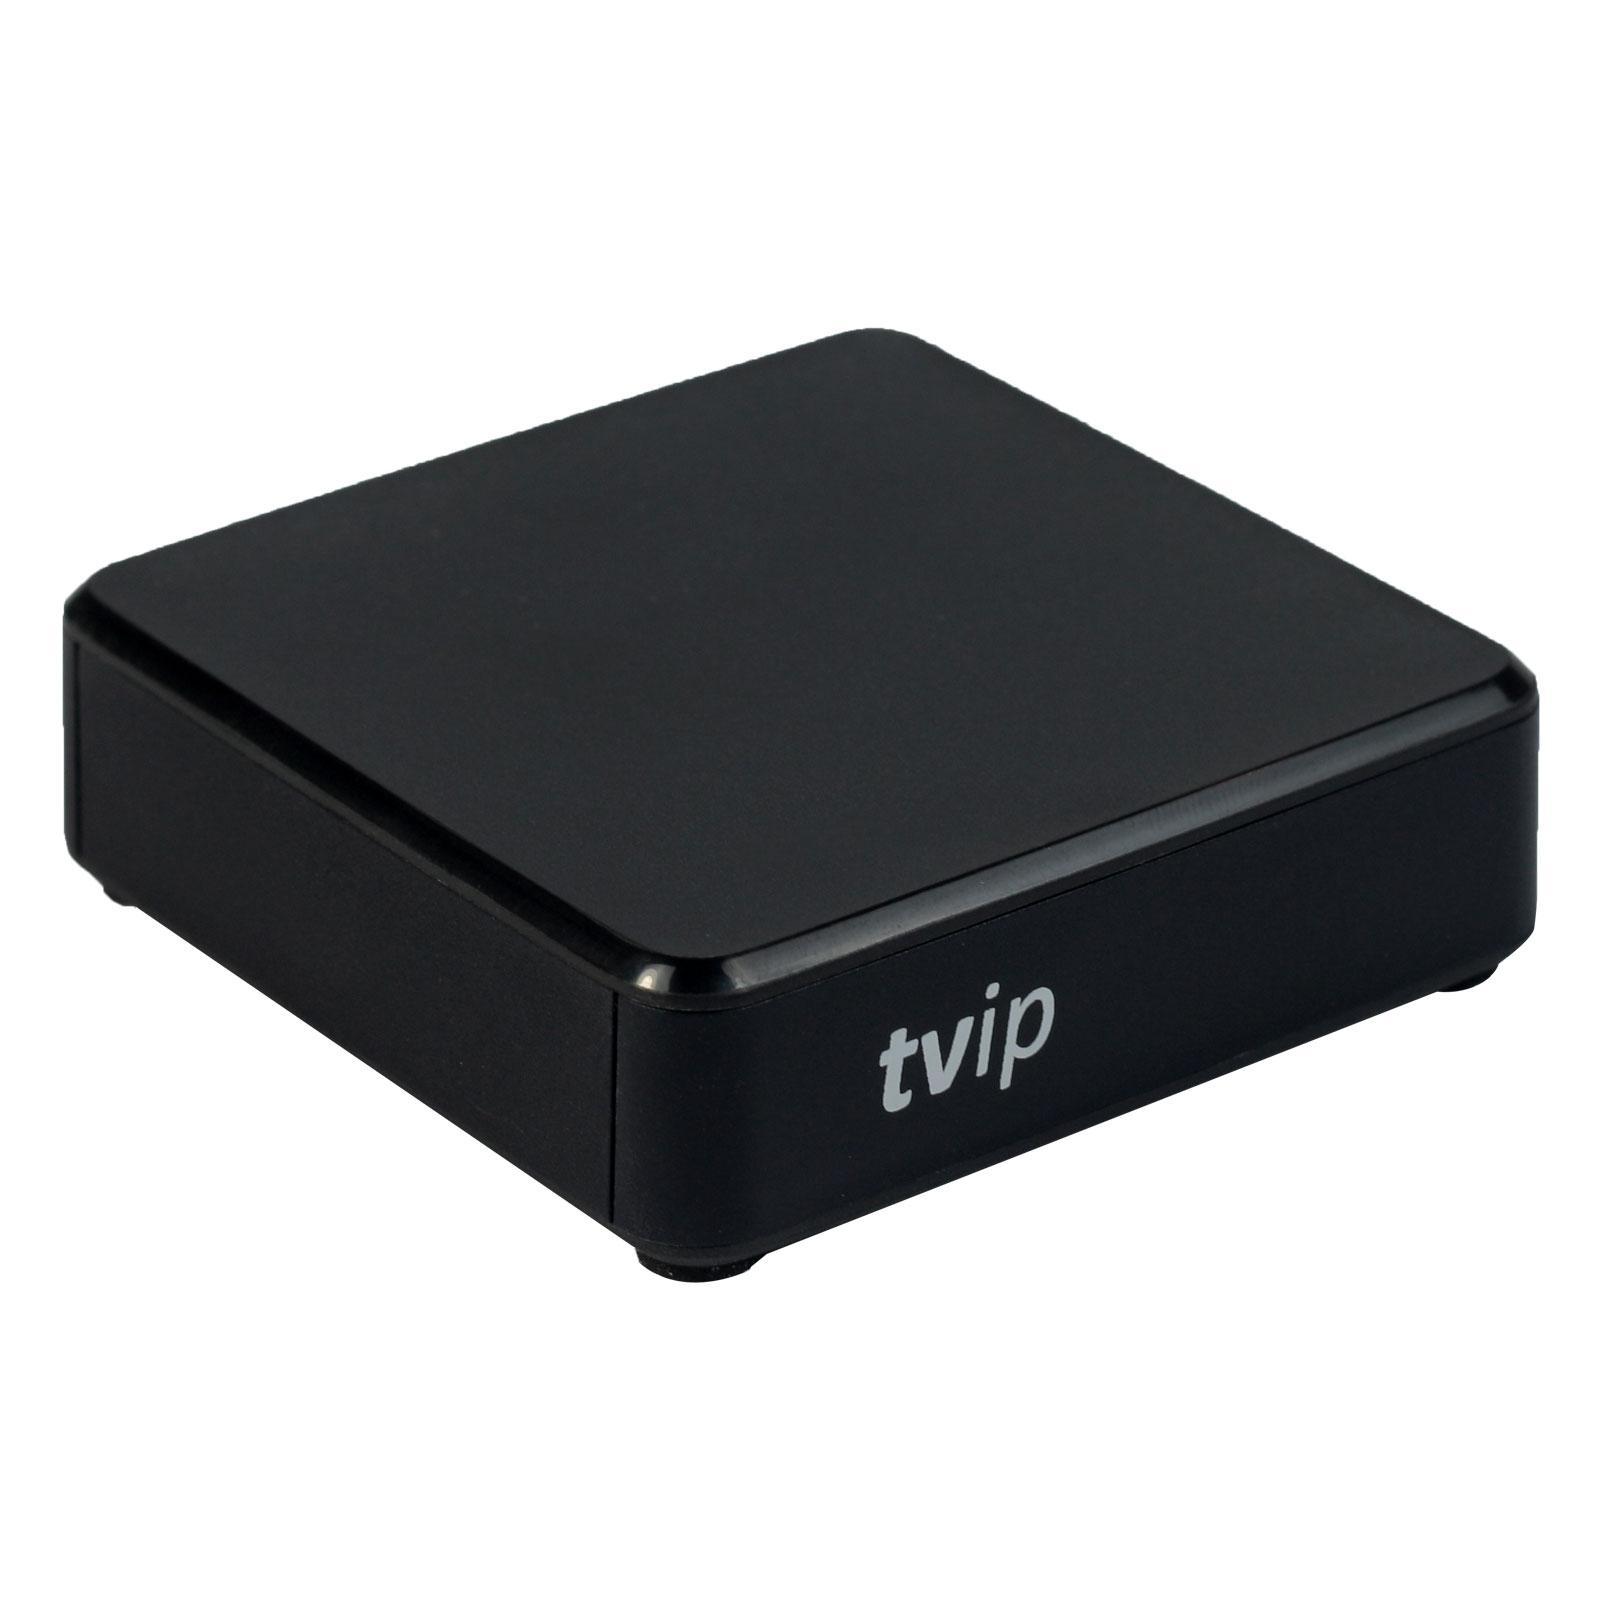 TVIP S-Box v.410se IPTV HD Multimedia Box Android schwarz